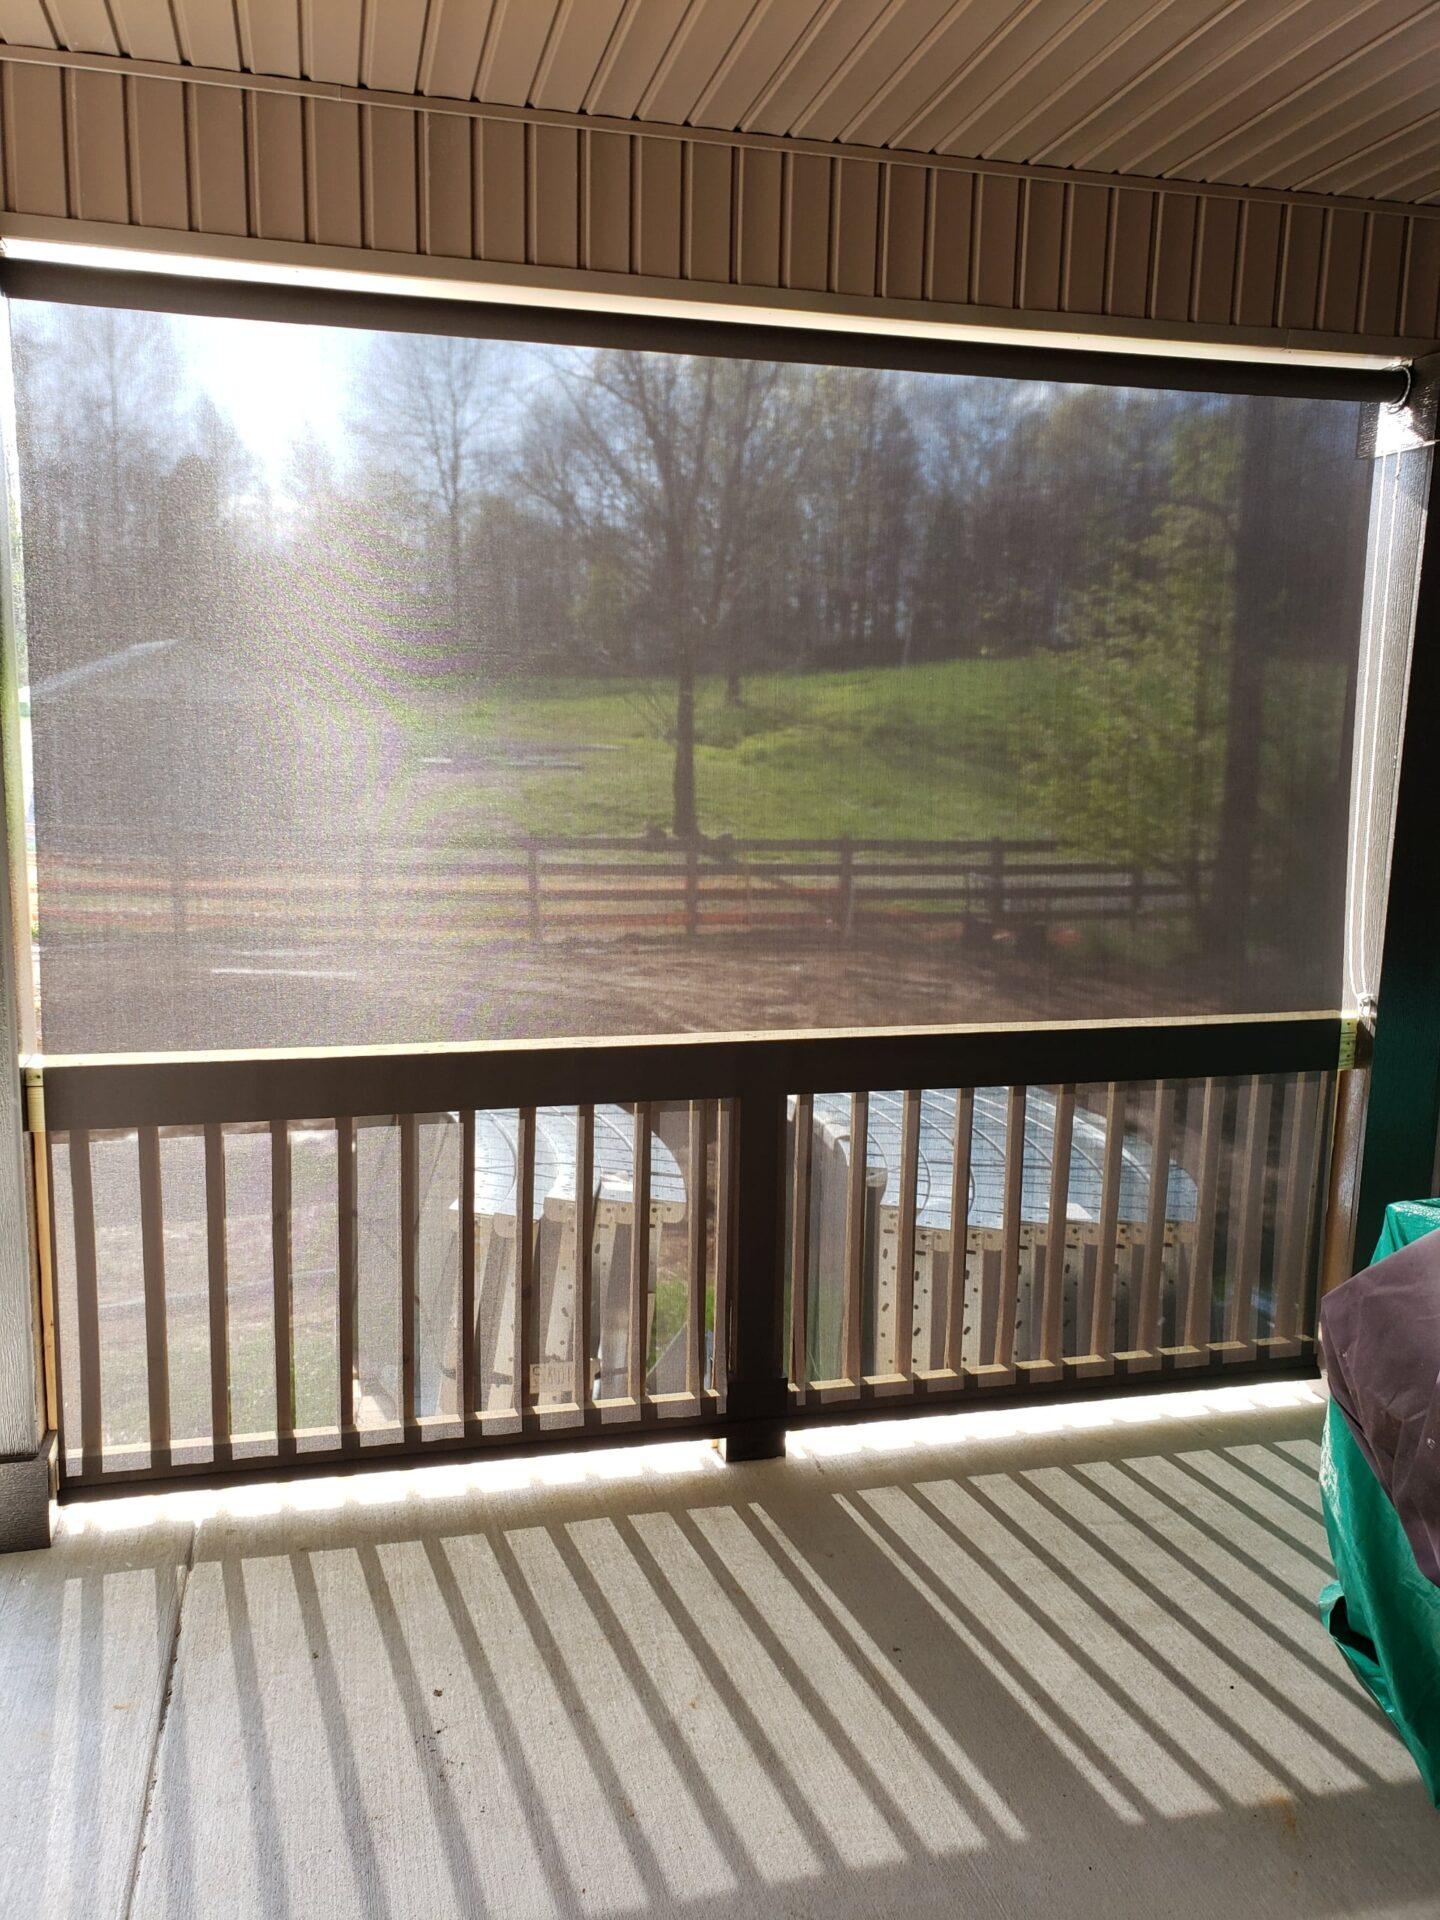 Window Patio Shades Gallery - Interior Window Plantation Shutters - Custom, Motorized Window Treatments, Blind Repair, Custom Blinds | Nashville, TN